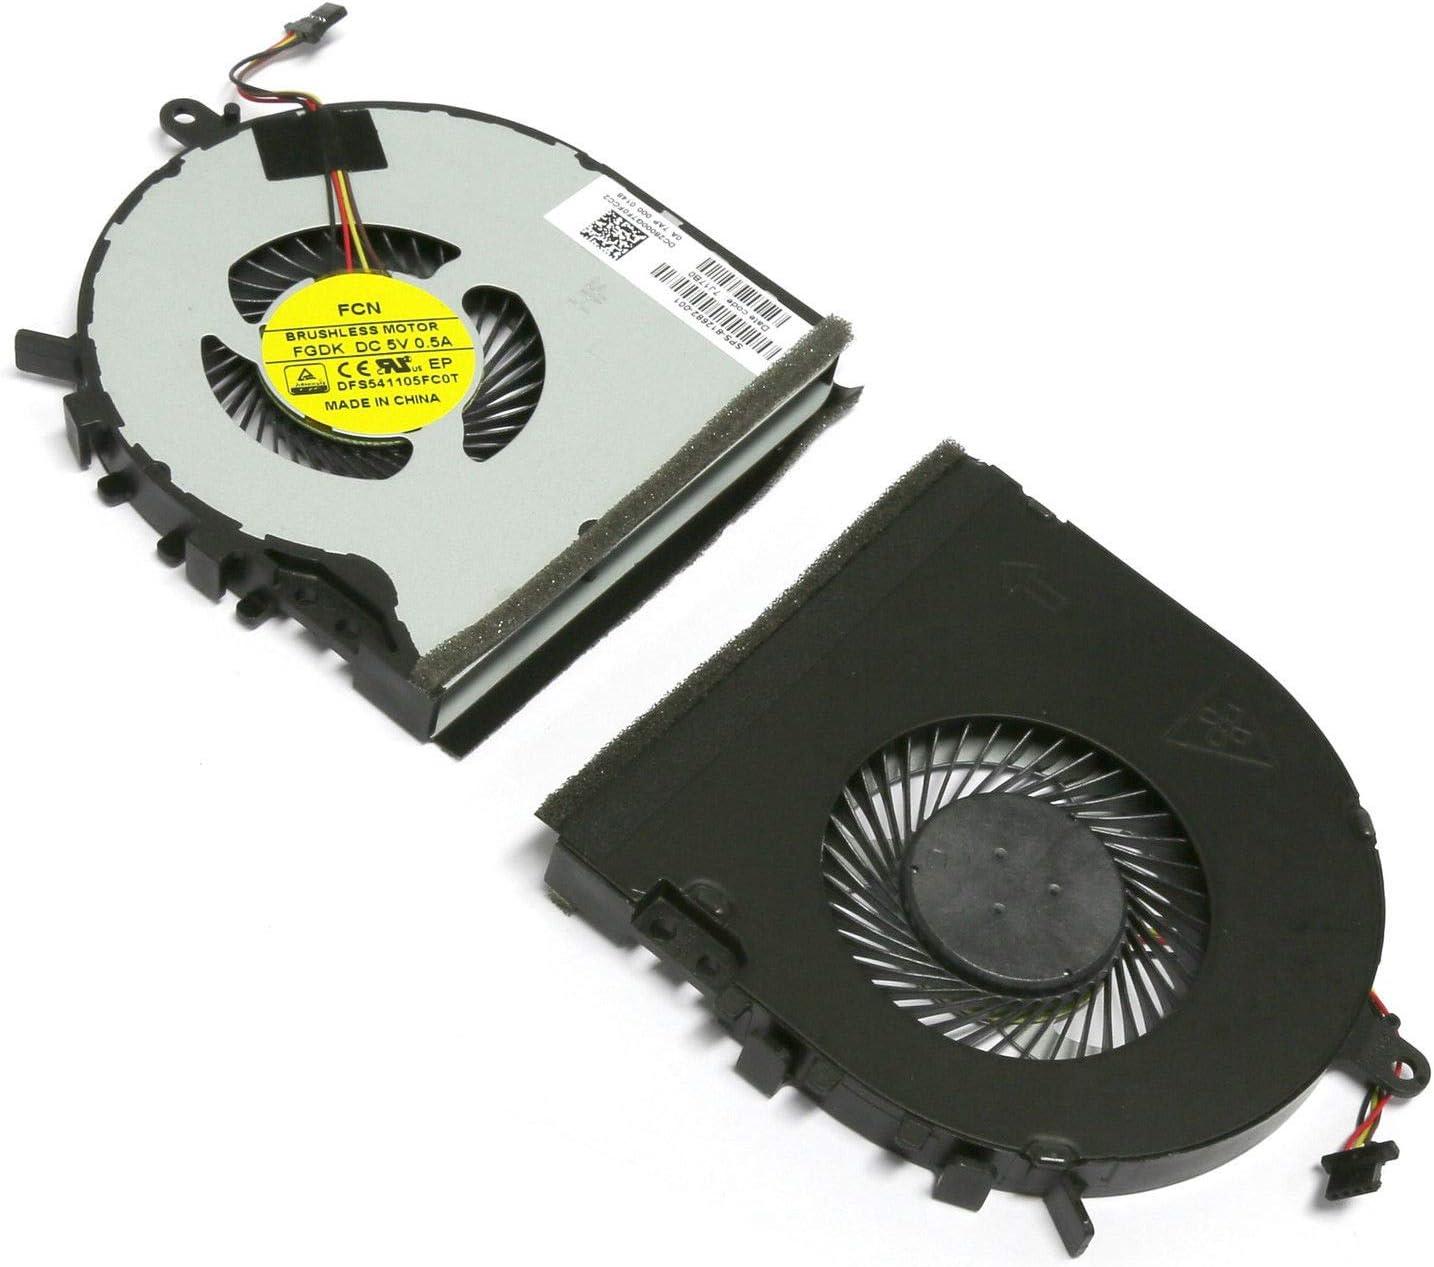 New Laptop CPU Cooling Fan for HP Envy M6-P100 M6-P000 M6-P113DX M6-P114DX 812682-001 EF75070S1-C390-S9A